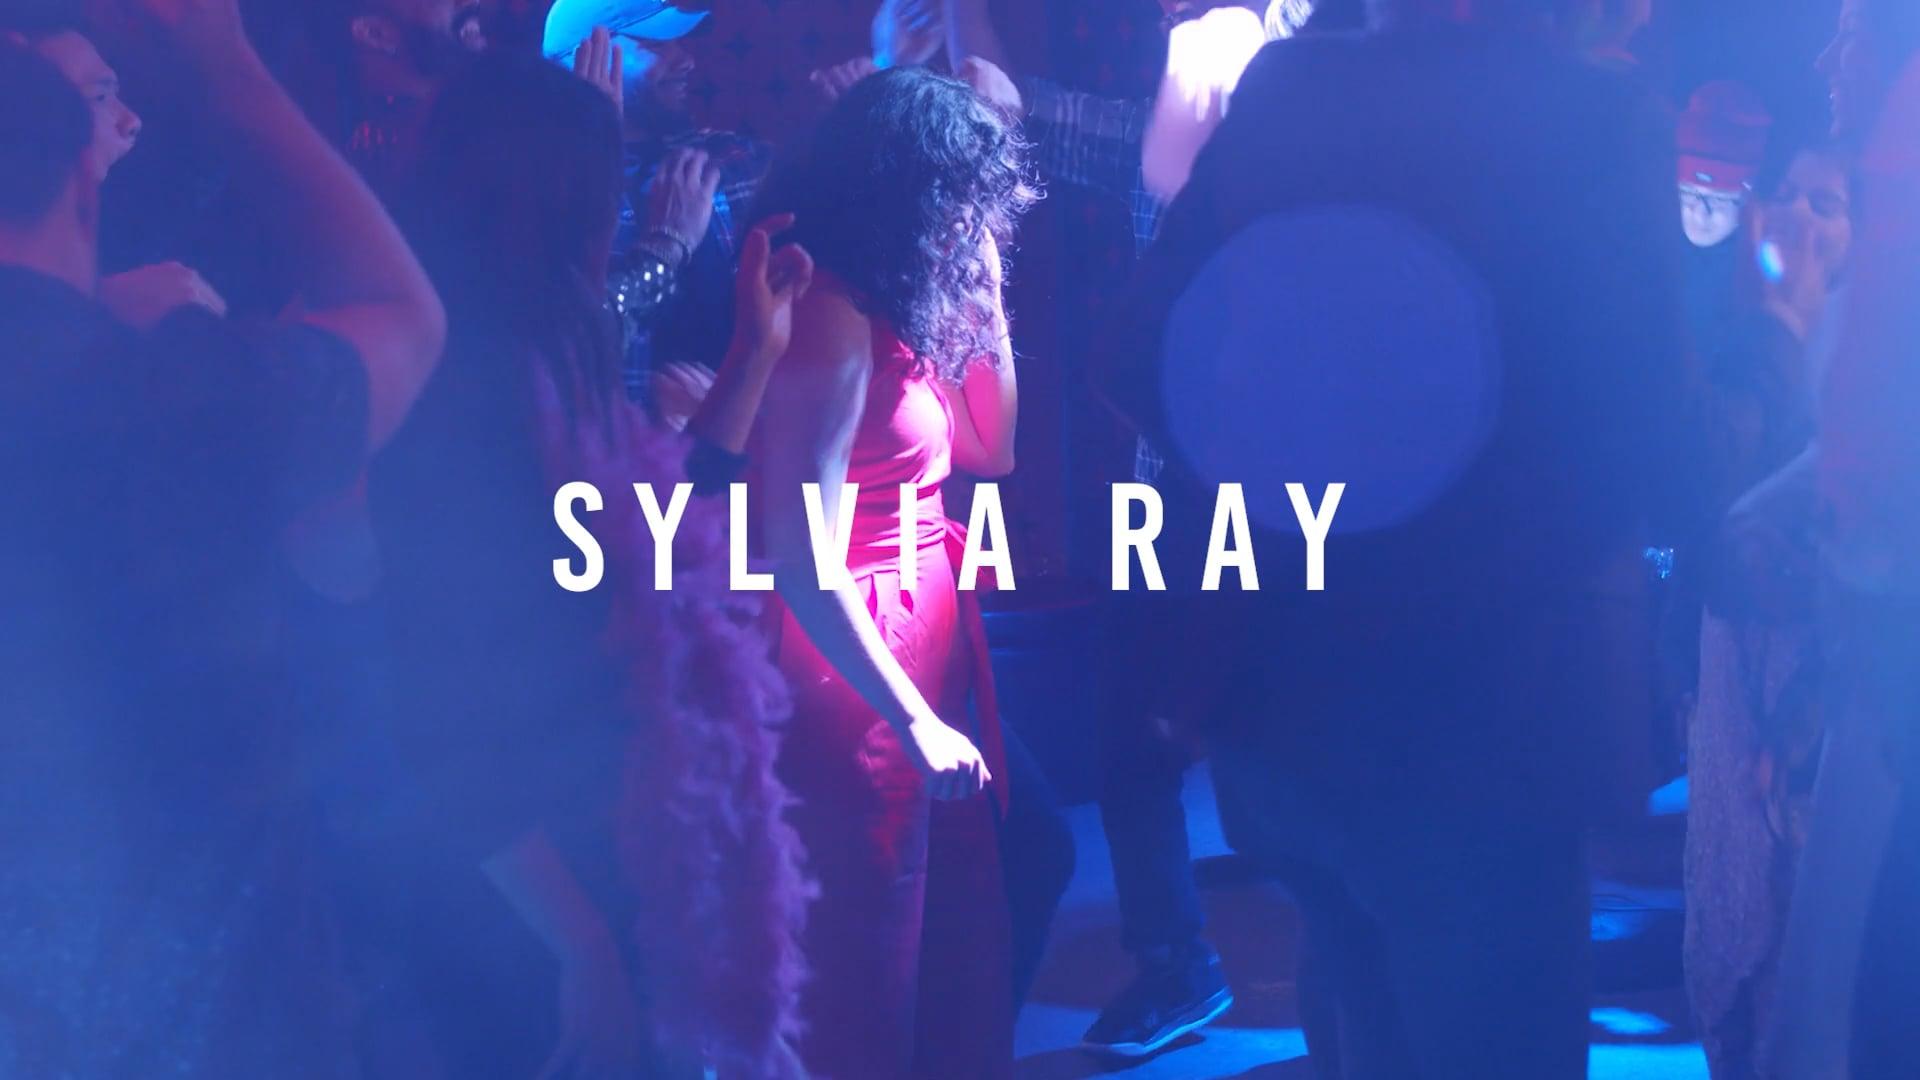 Sylvia Ray - Director's Showreel